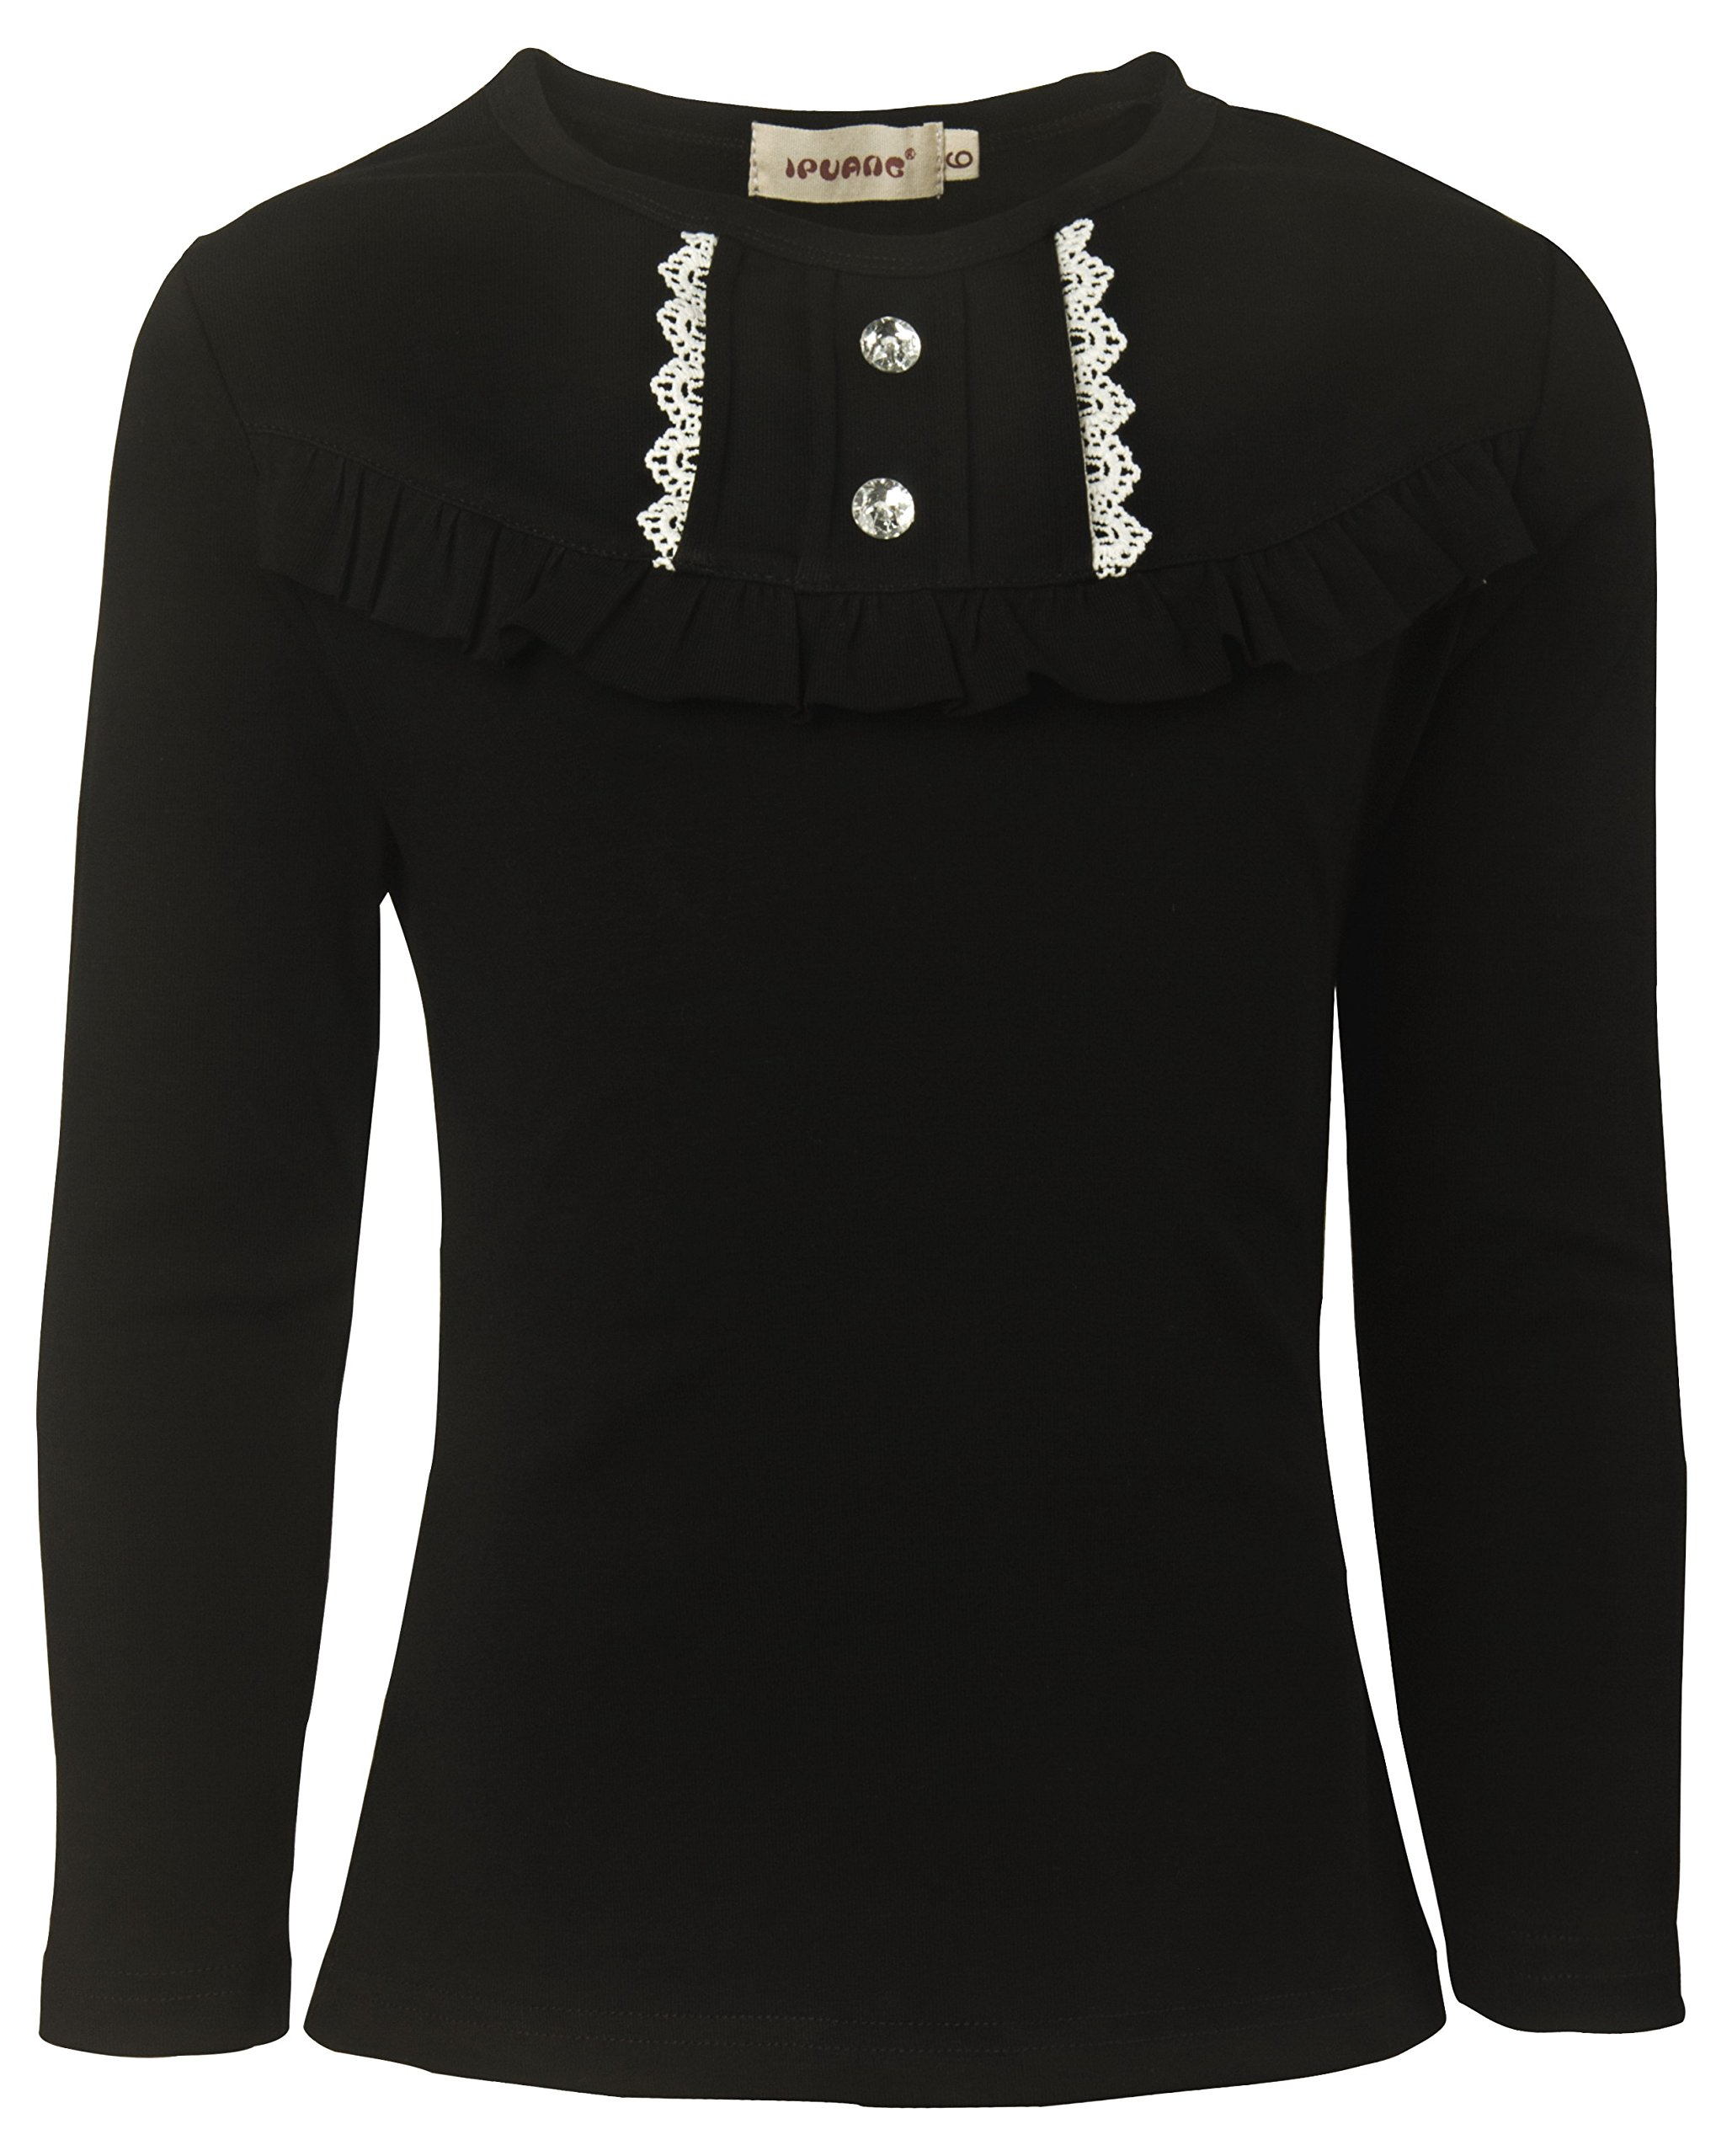 Ipuang Little Girl Long Sleeve Cotton Ruffle T Shirt Top 6 Black